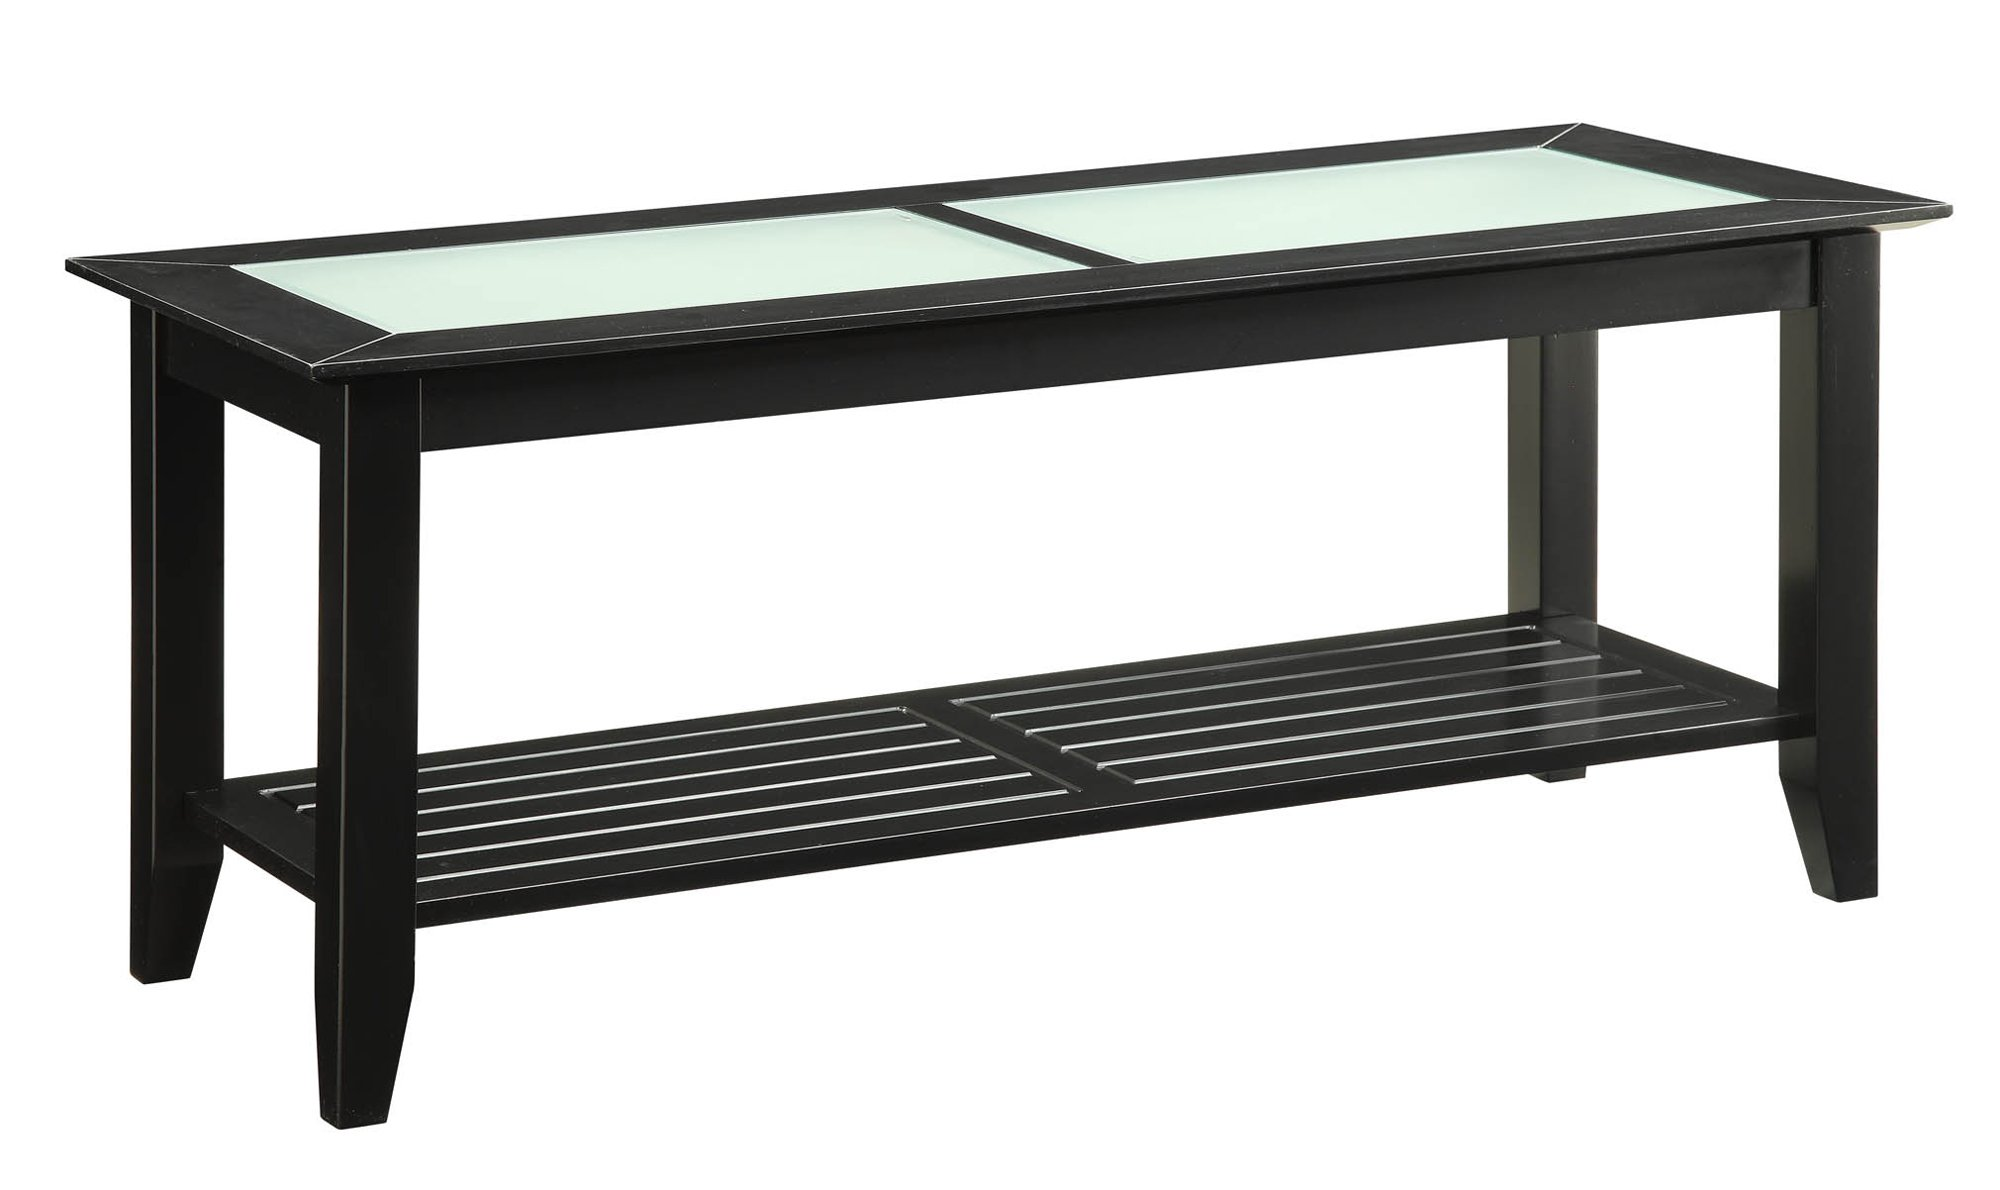 Convenience Concepts Carmel Coffee Table, Black